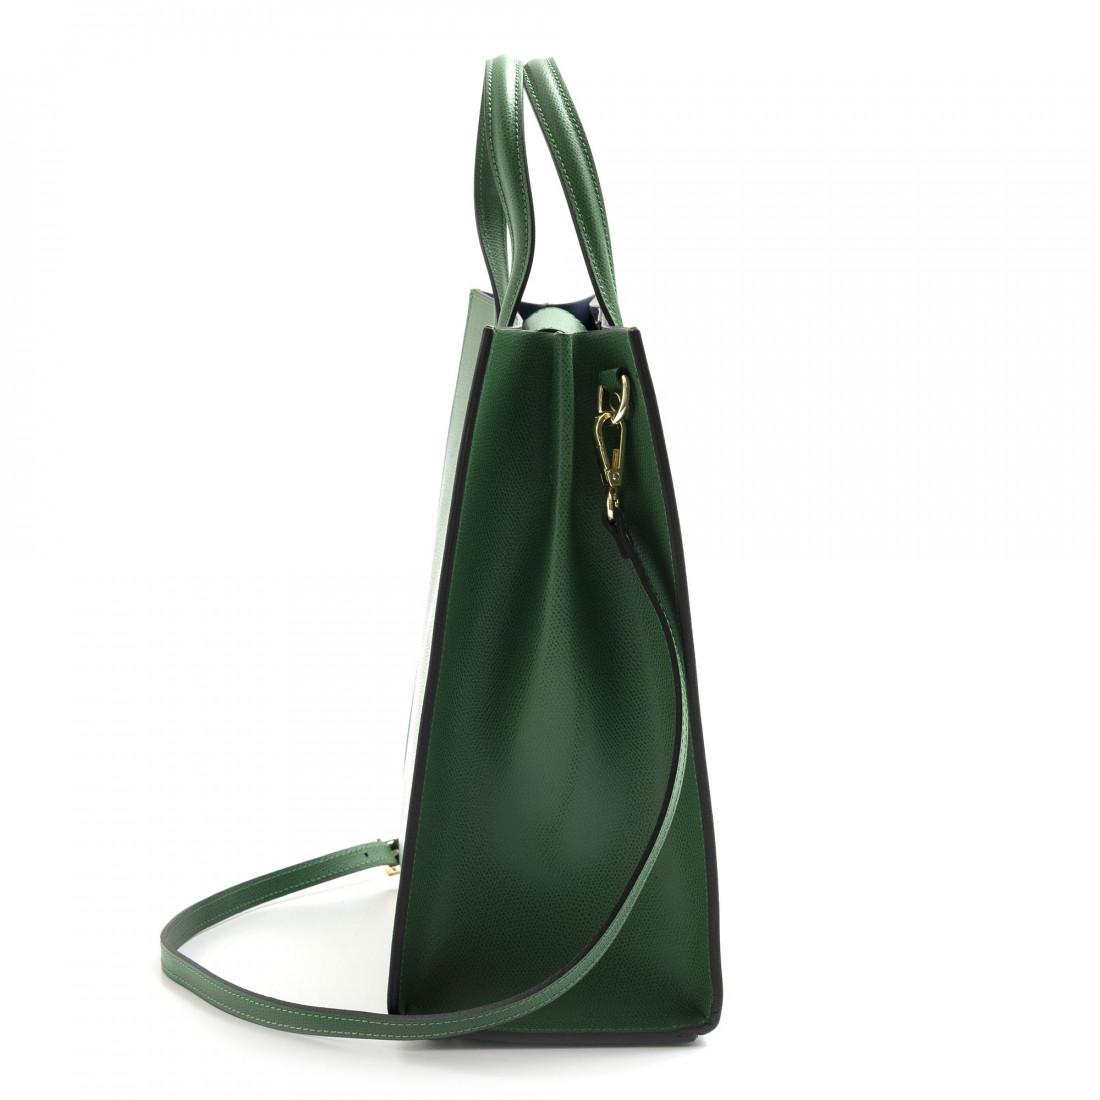 handbags woman my best bags myb6015verde 7571